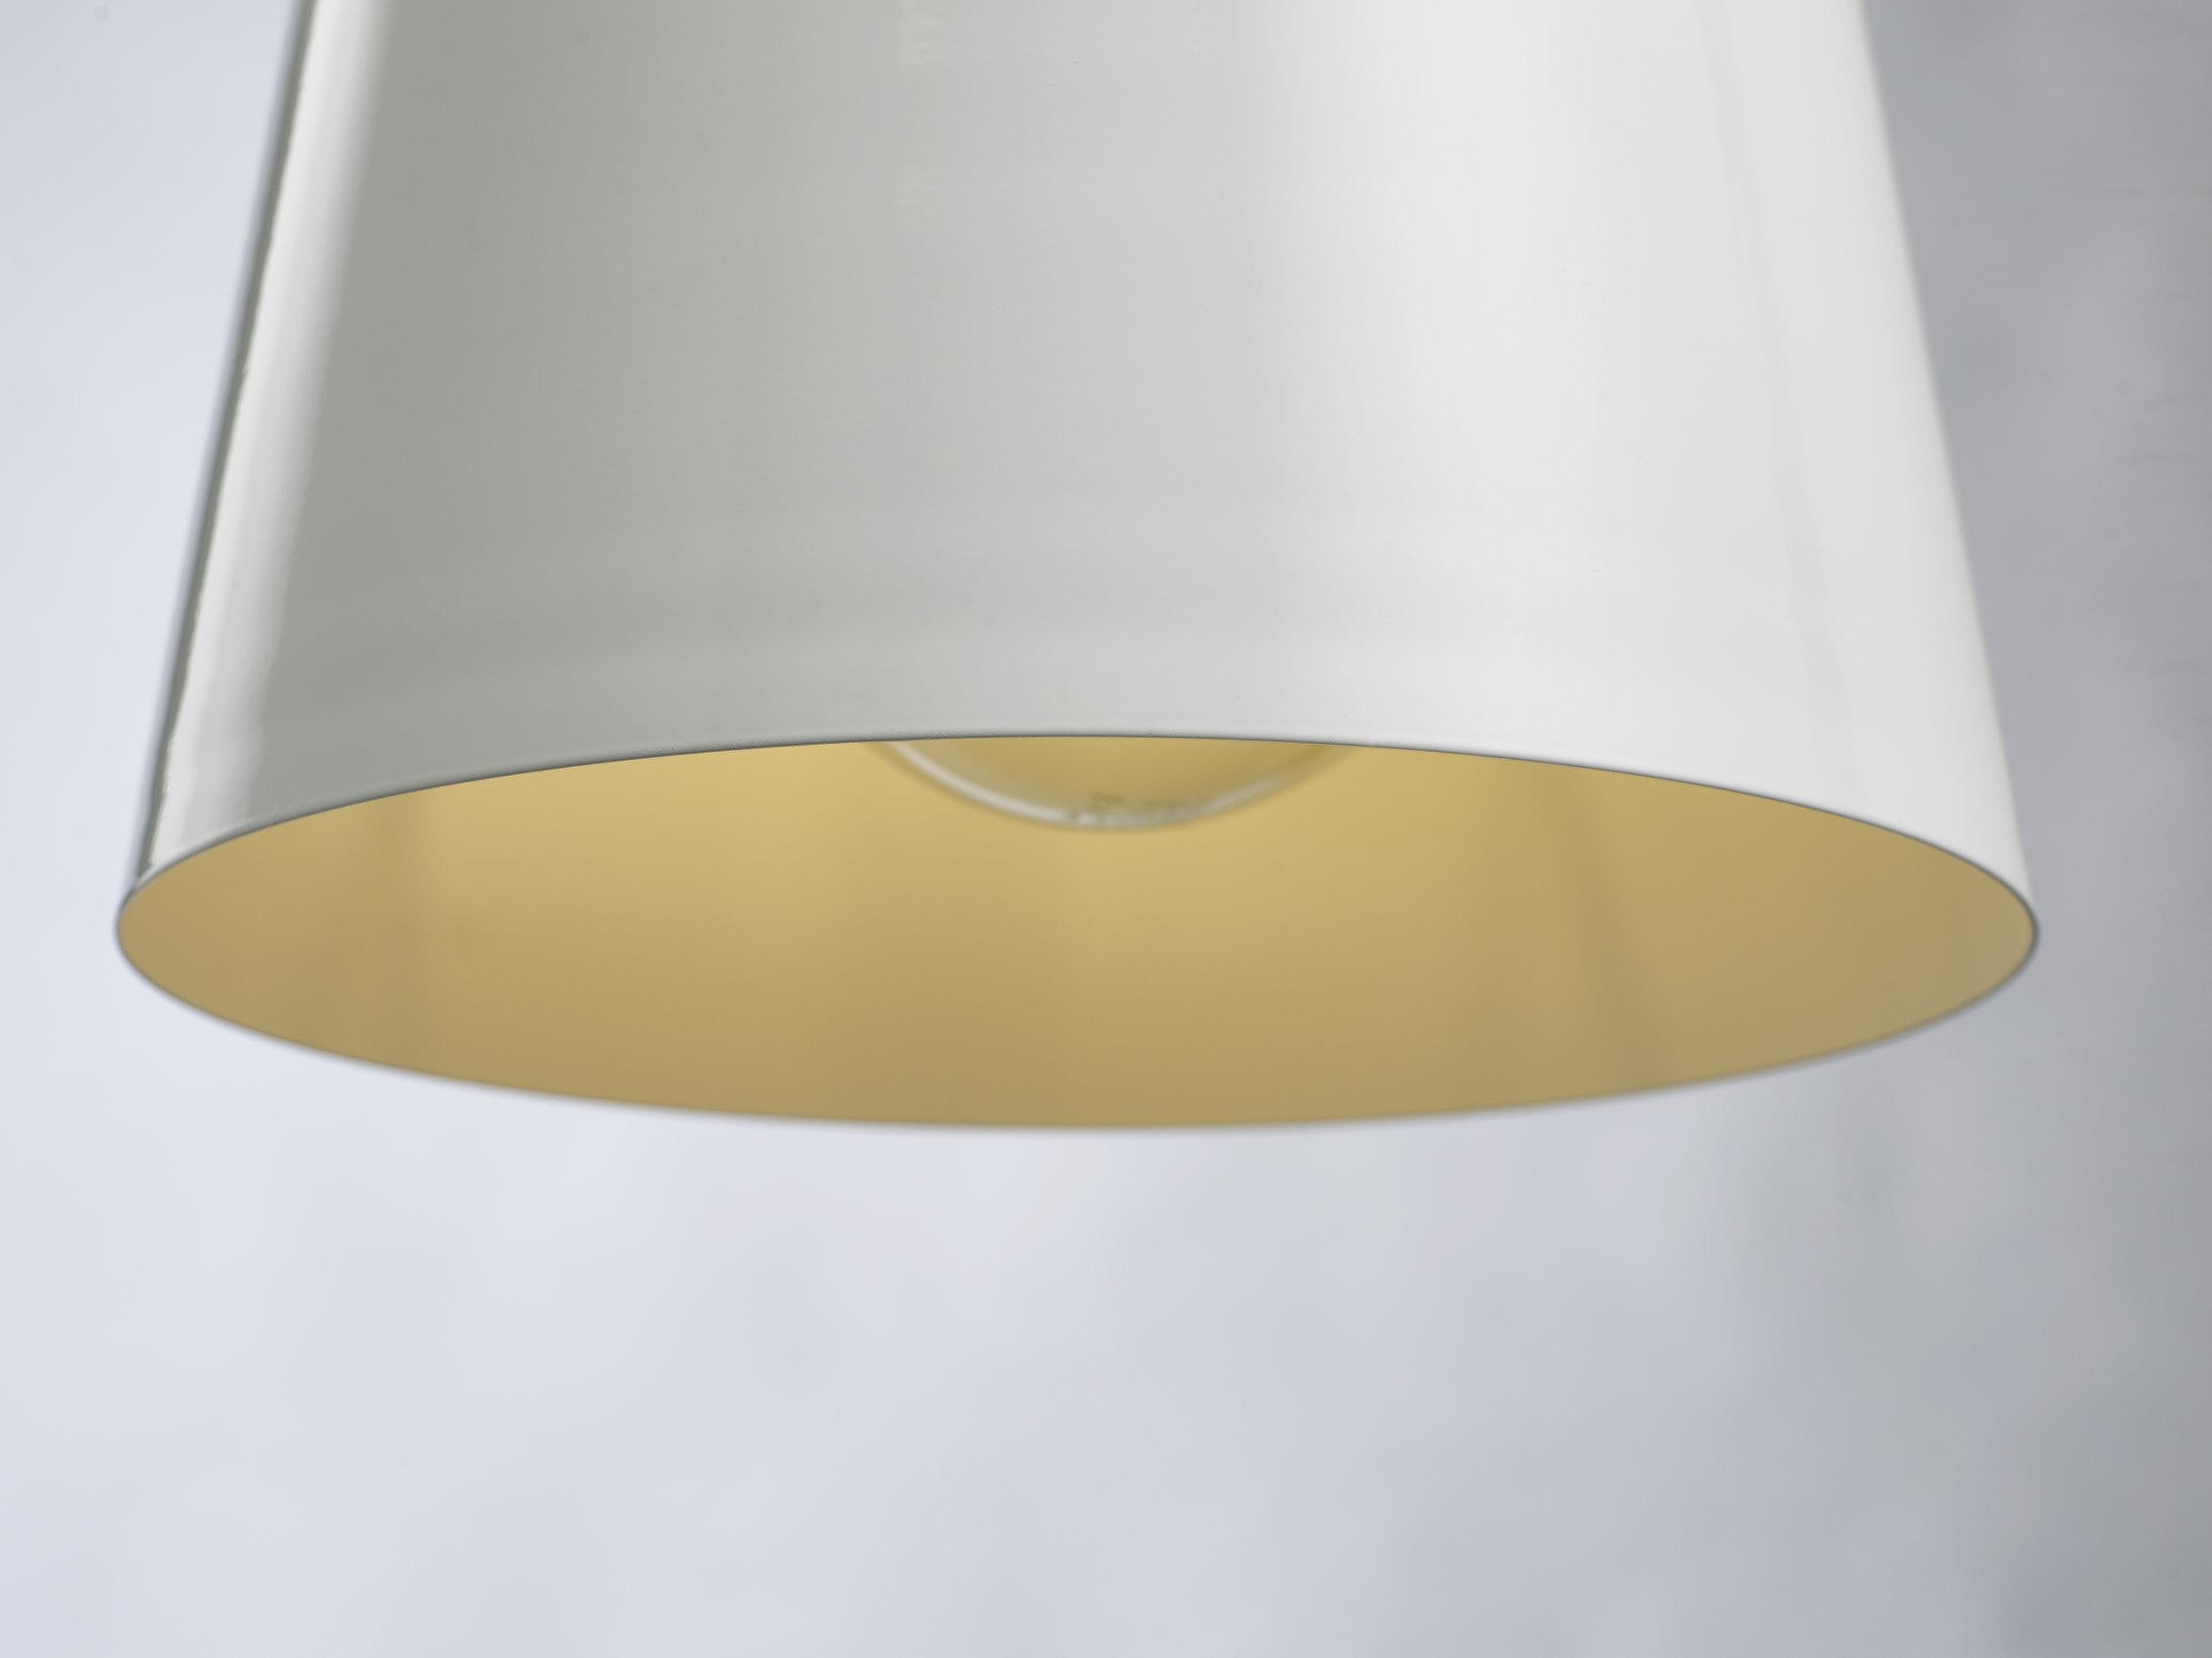 VETICA LAMPEN-WEISS 1tif.jpg